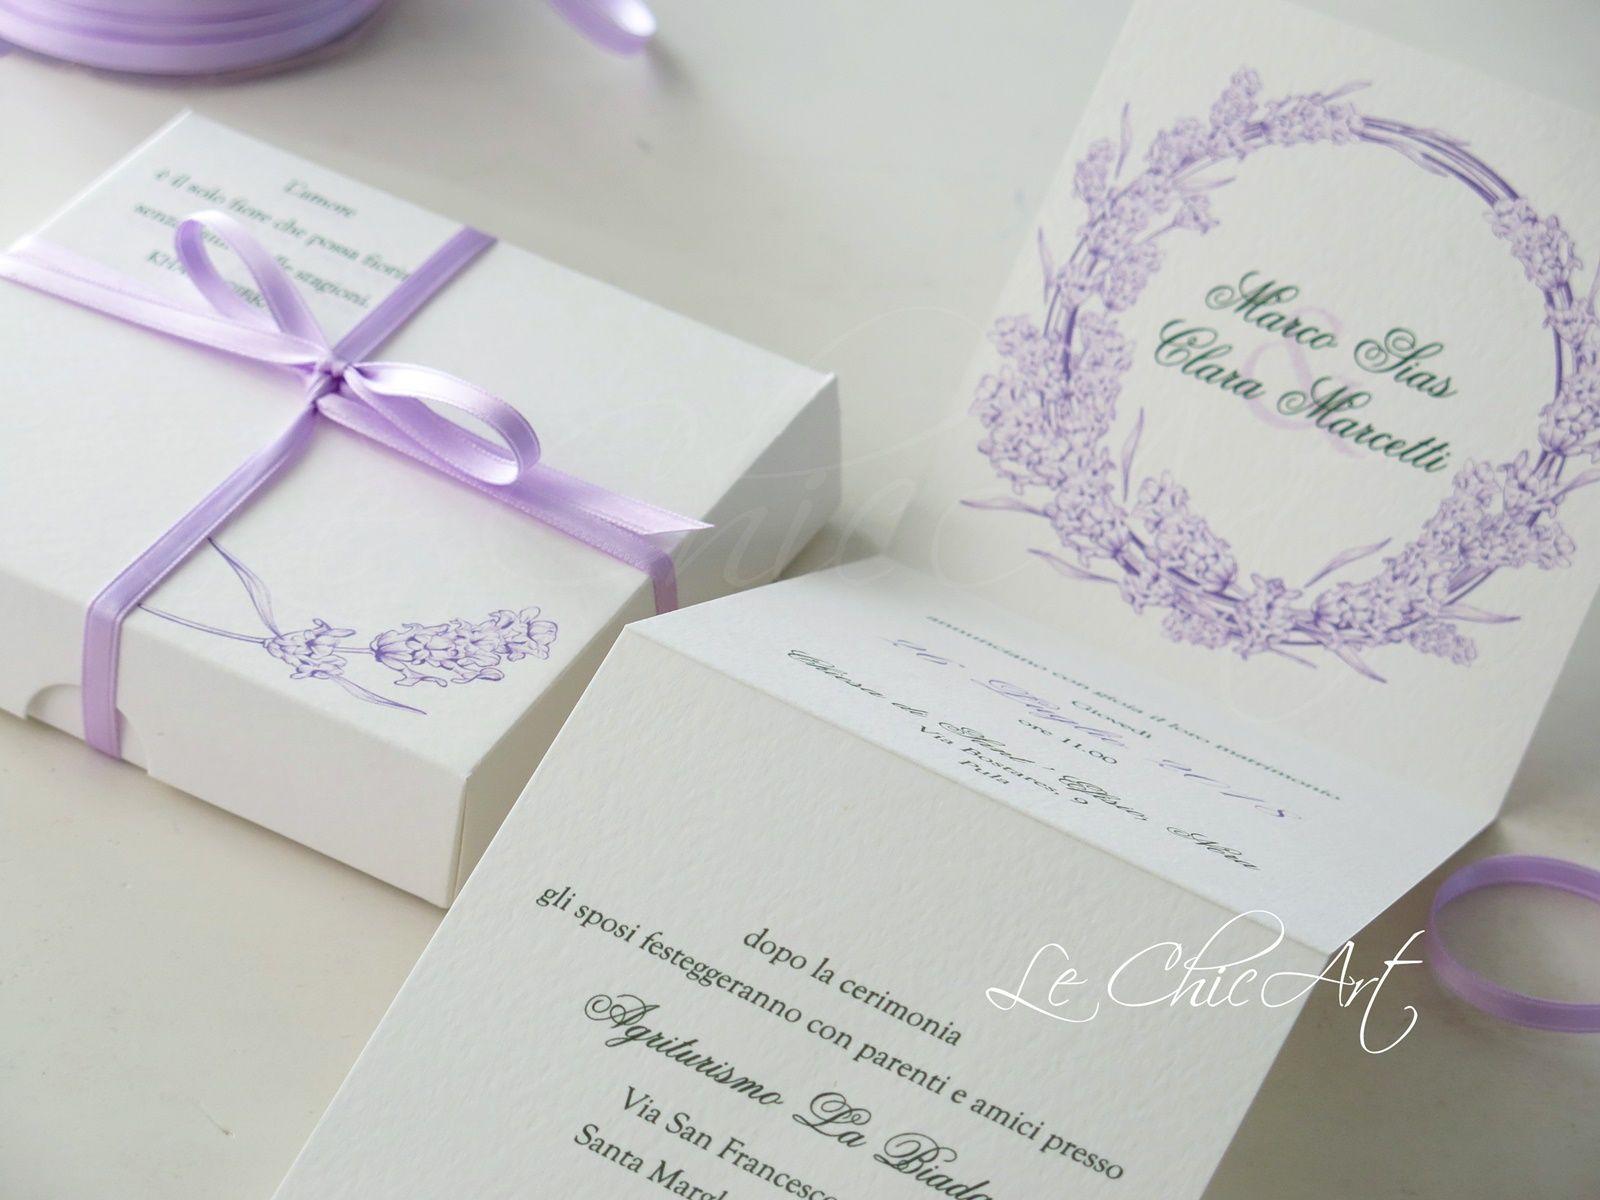 Partecipazioni Matrimonio Lavanda.Partecipazione Lilla Tema Lavanda Matrimonio Matrimonio Lilla